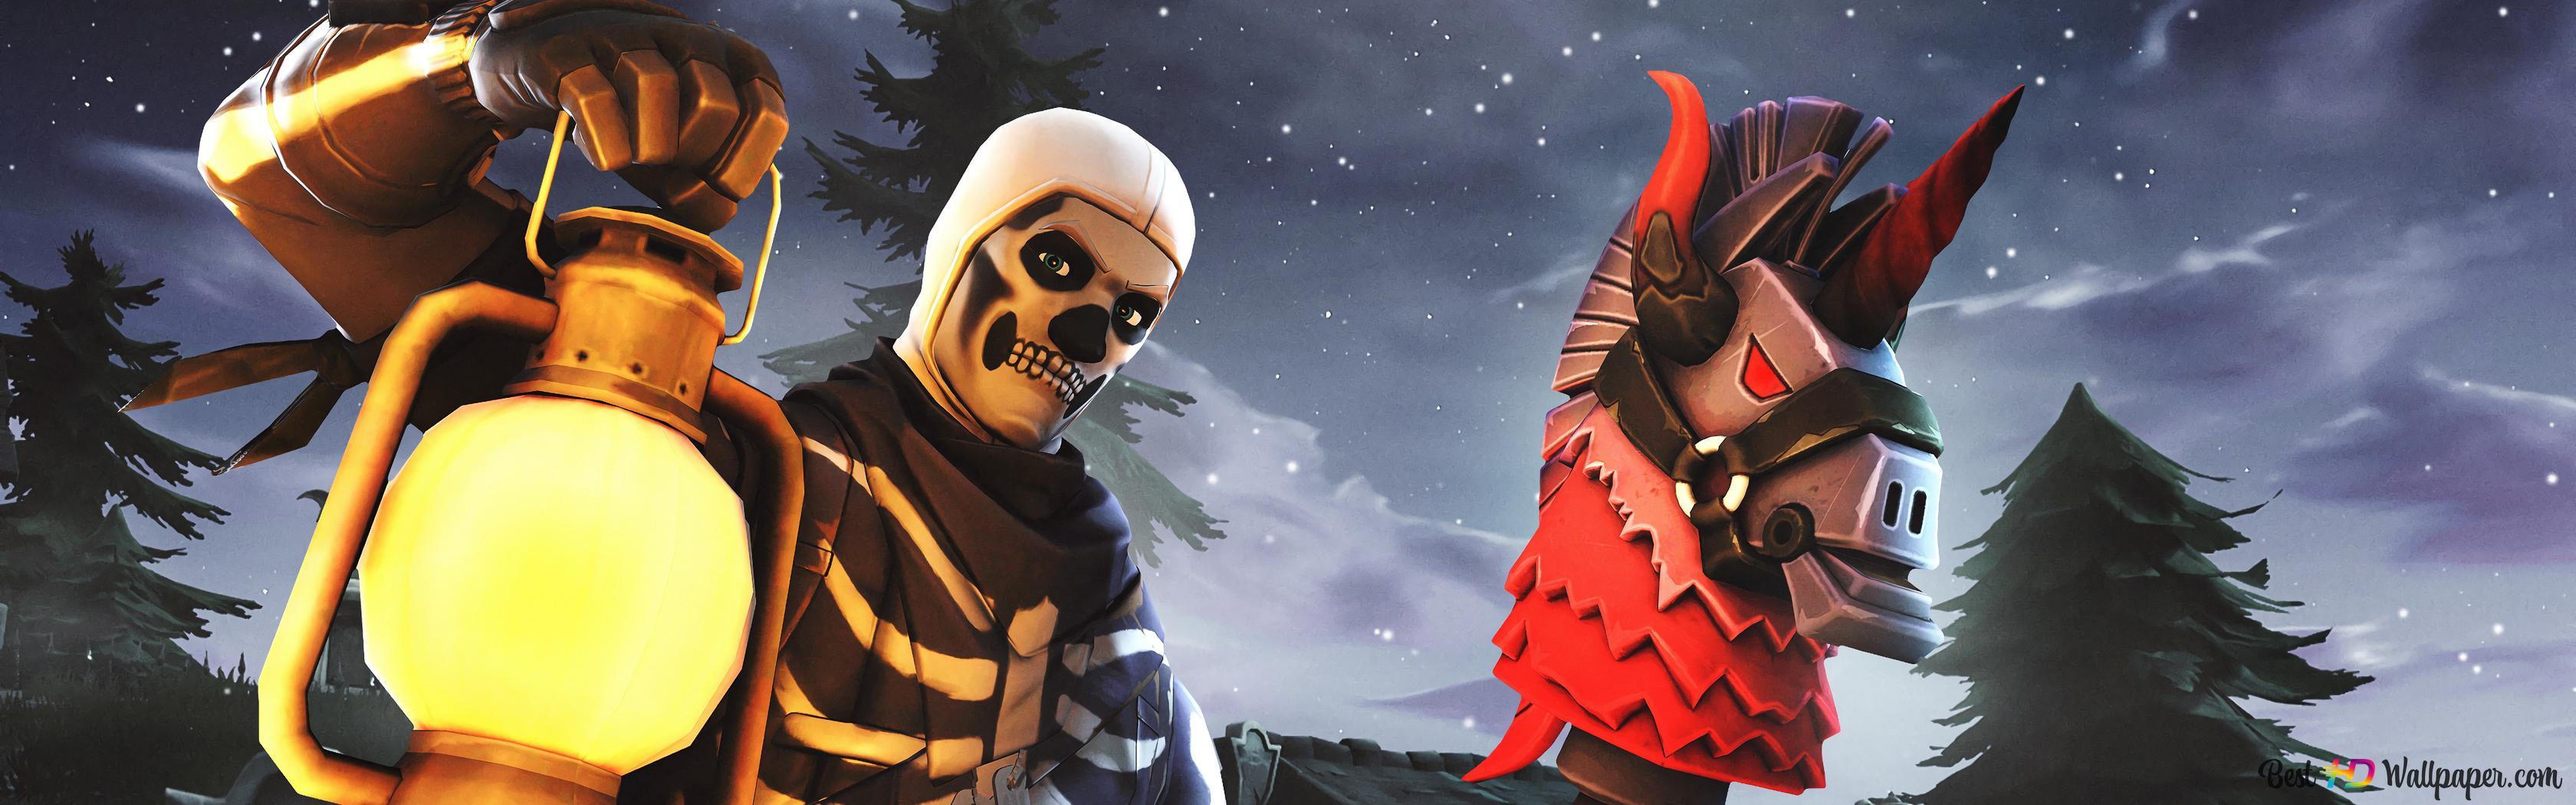 2048x1152 Fortnite Skull Trooper Www Topsimages Com